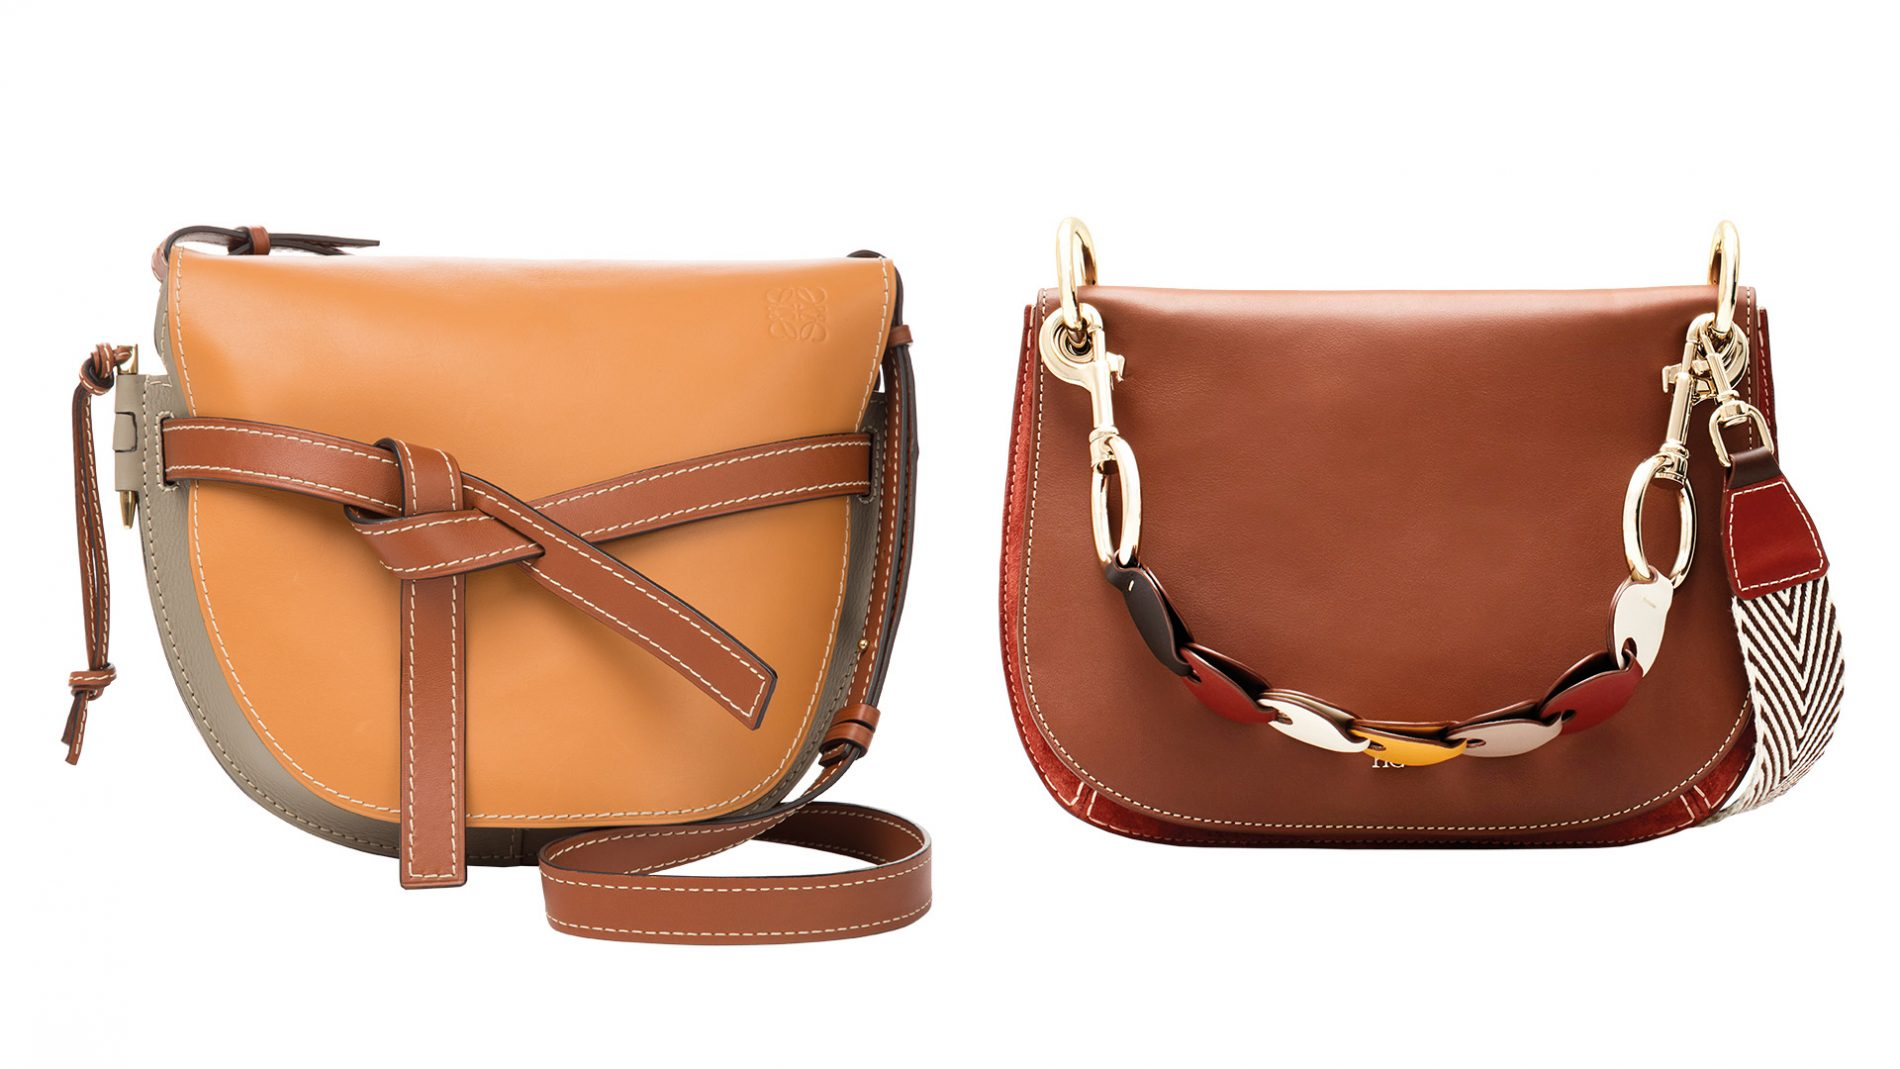 El Corte Inglés Designer Handbags Loewe Carolina Herrera